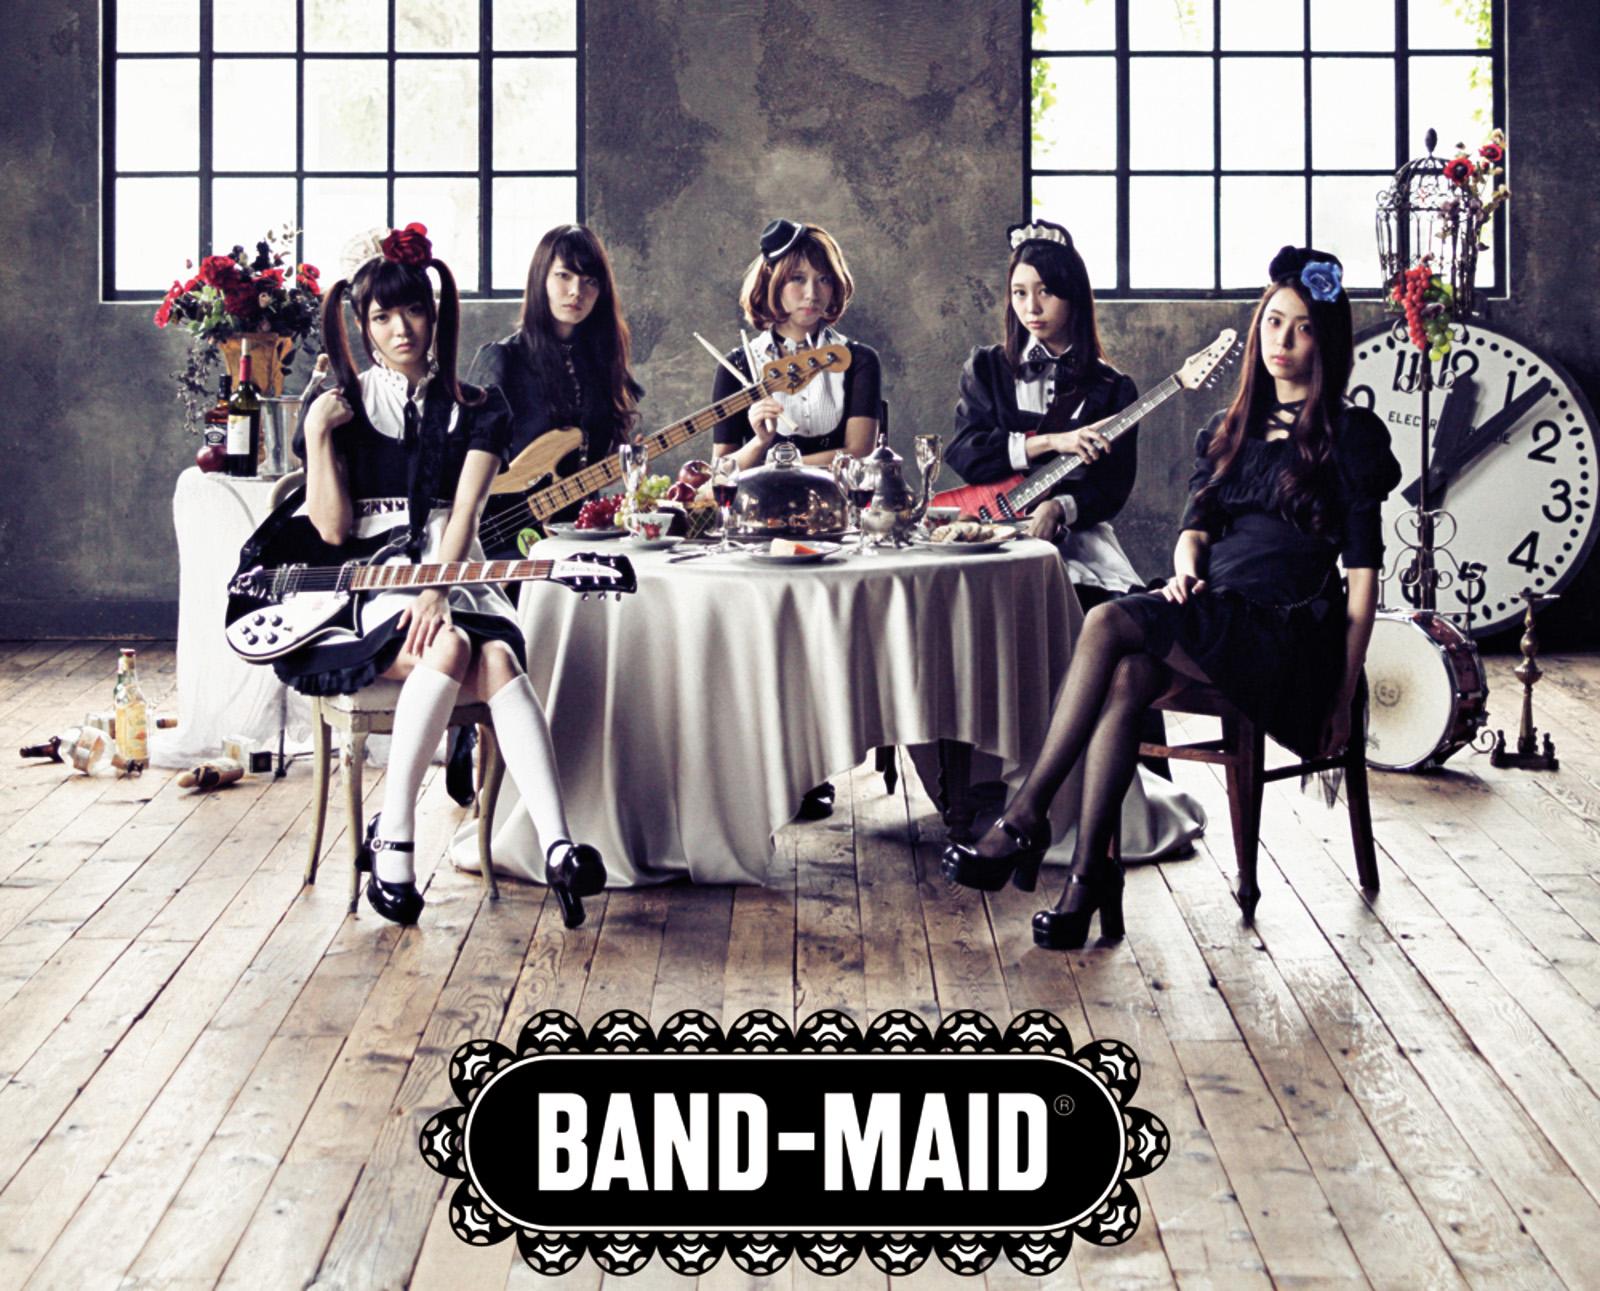 RMMS-BAND-MAID-2015-10-group-3